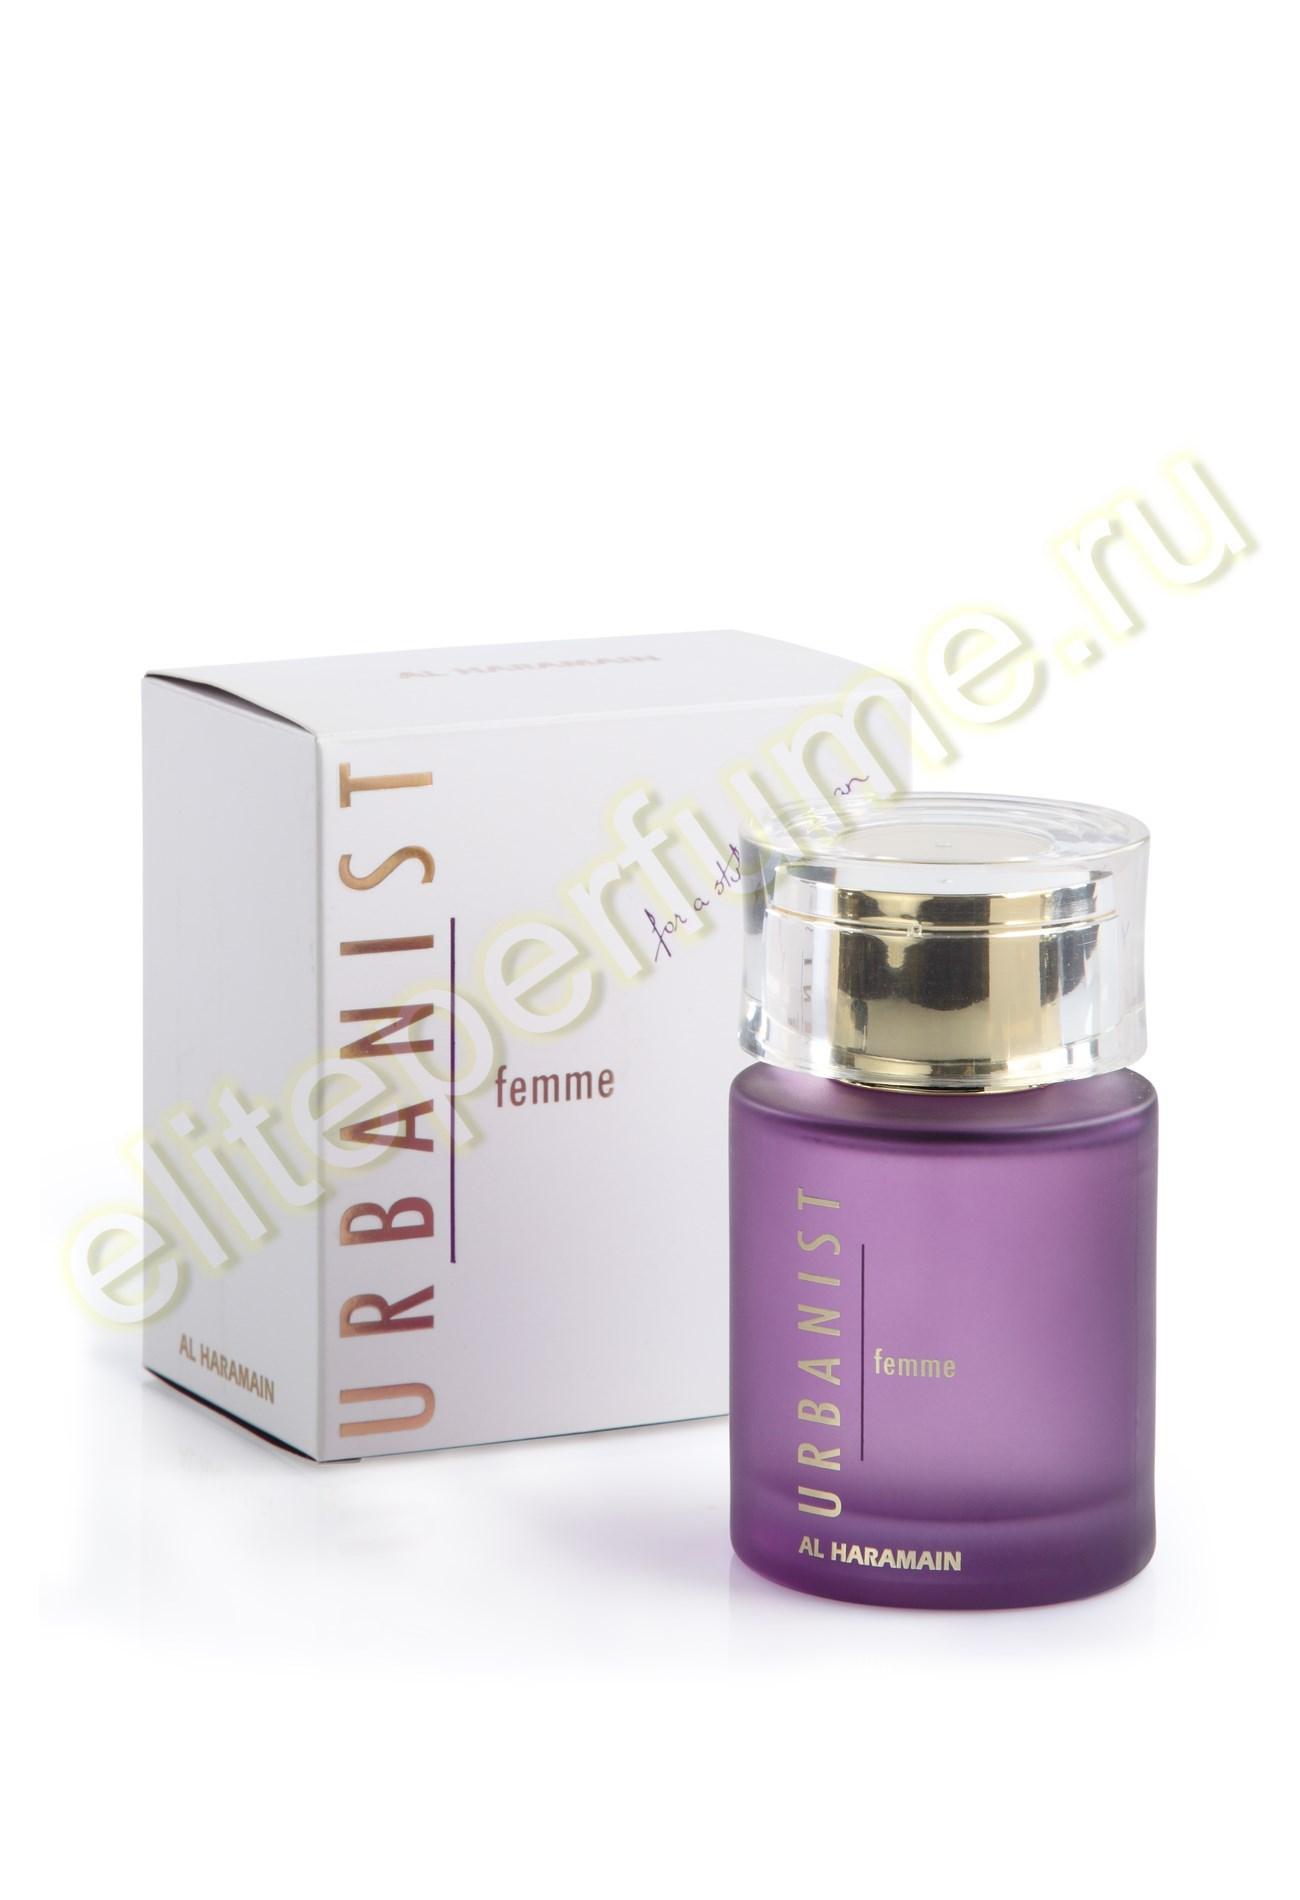 Urbanist femme Современный город женский спрей 100 мл спрей от Аль Харамайн Al Haramain Perfumes